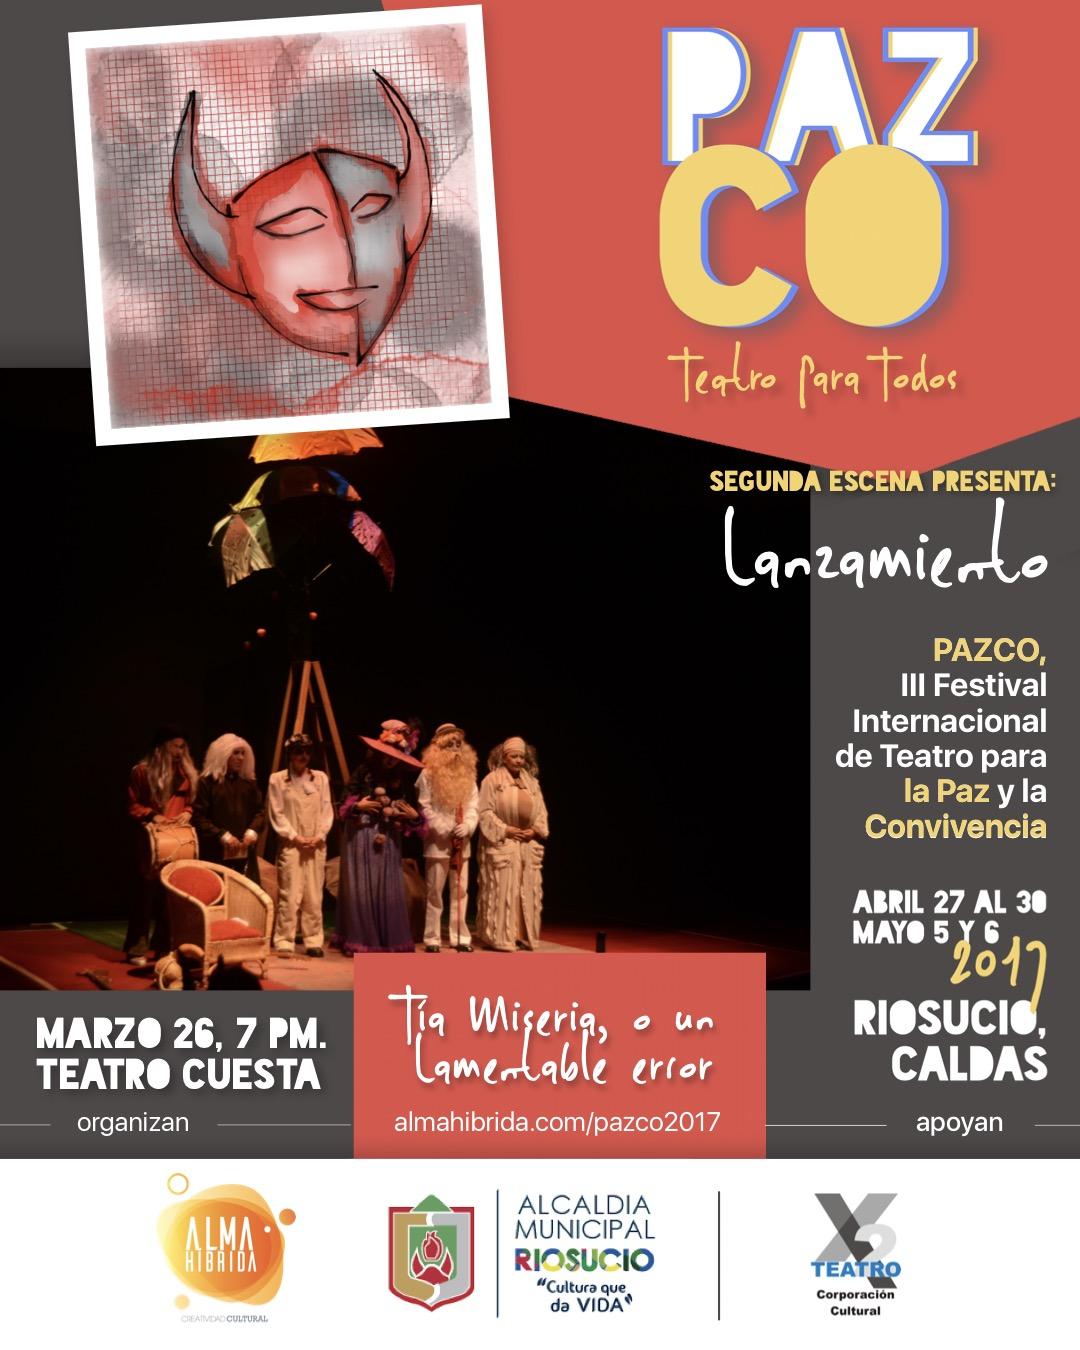 Pazco - Poster Lanzamiento.JPG